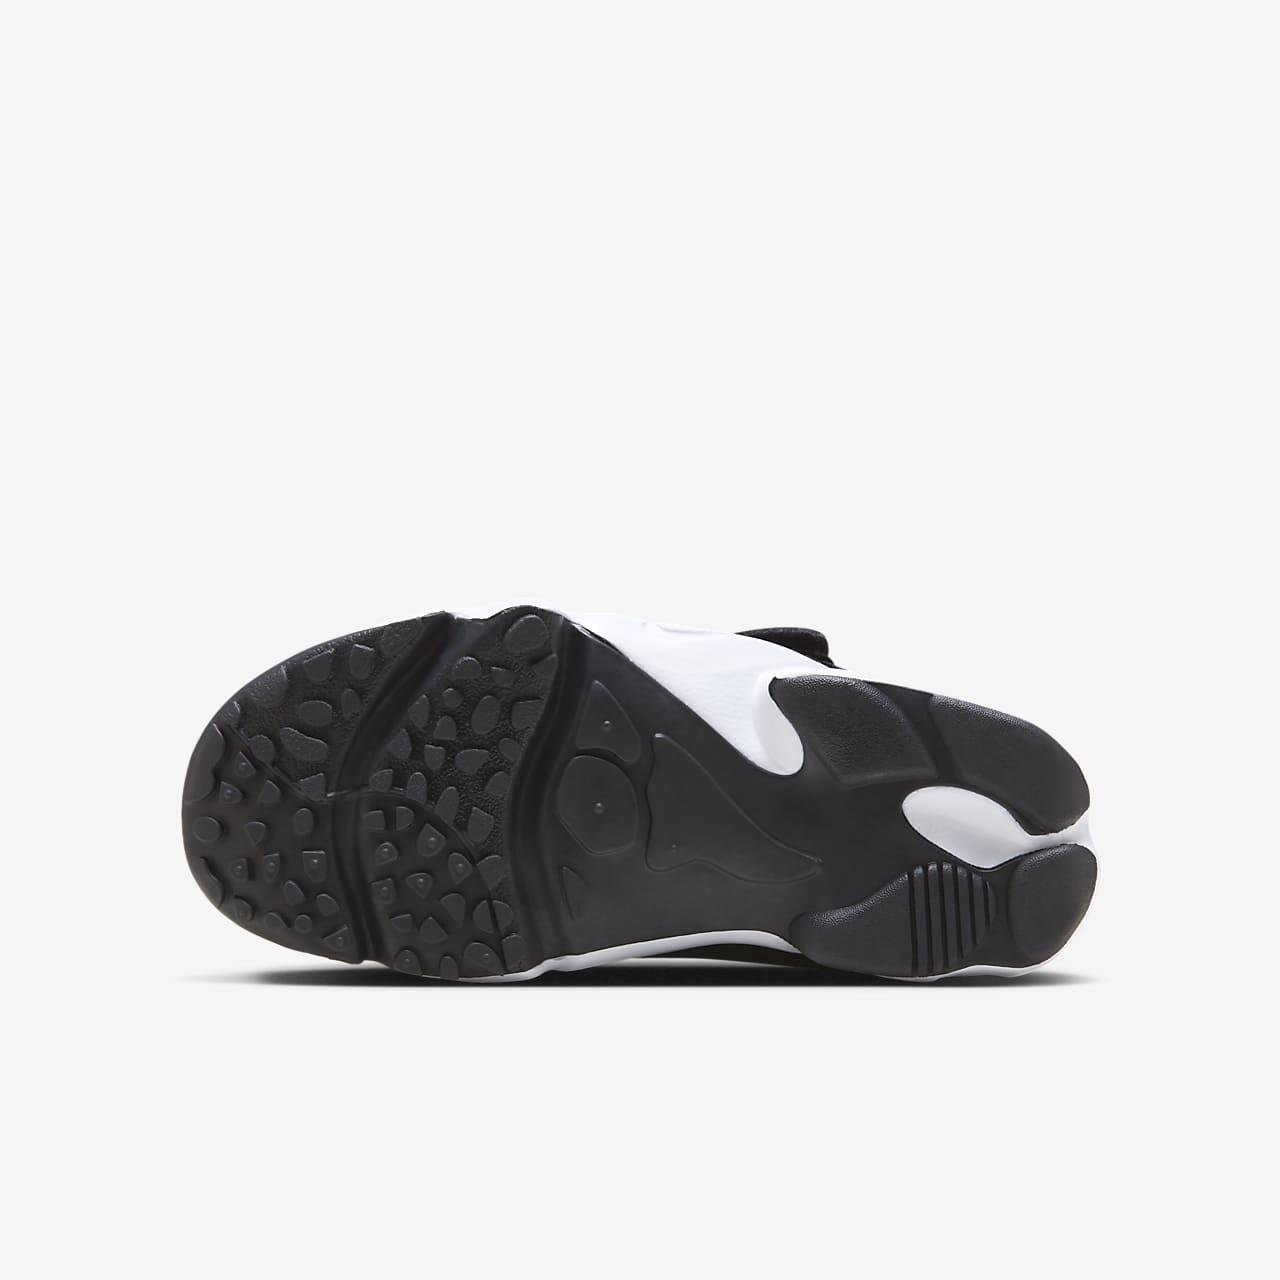 quality design f8616 ee651 ... Nike Air Rift (10.5c-3y) Kids  Shoe